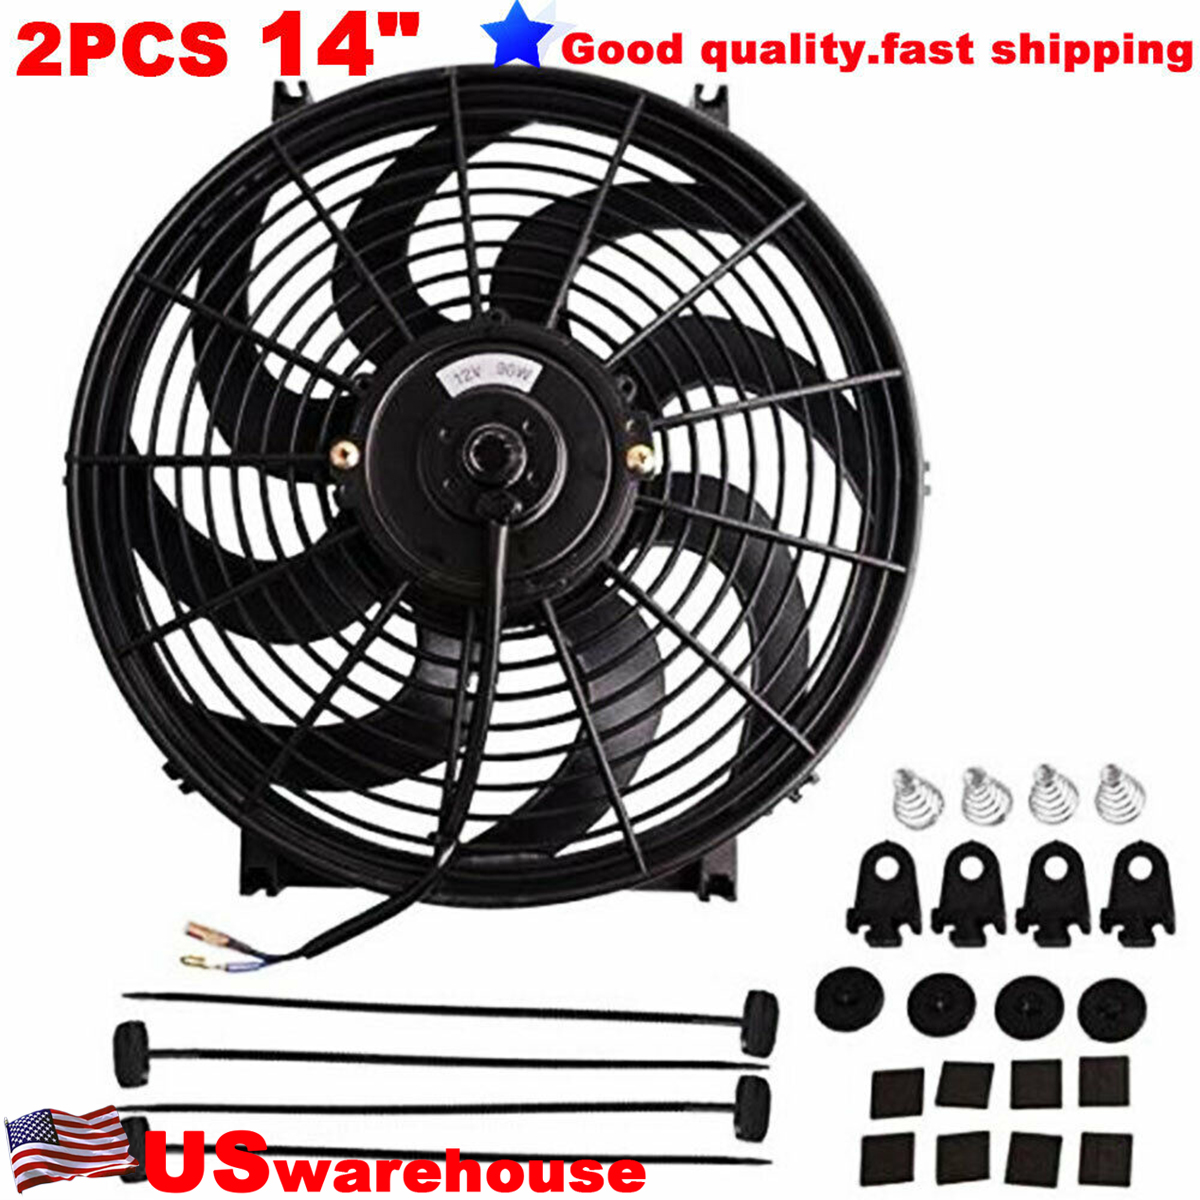 "12 Inch S-Blade Curved Reversible 1000 CFM Radiator Cooling Fan 12/"" Fan"